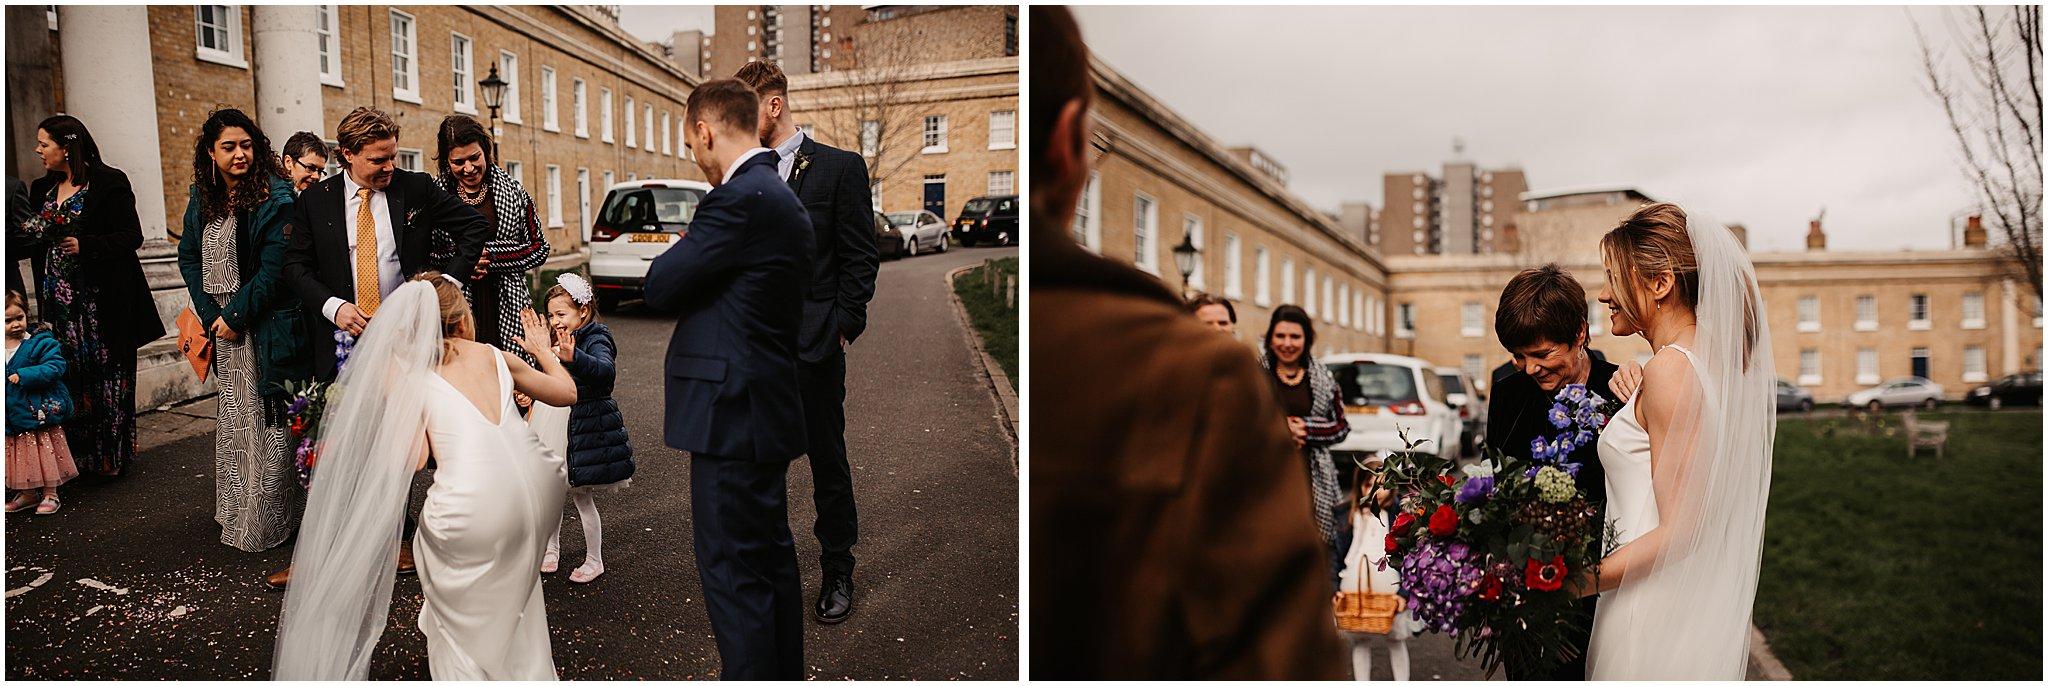 James & Ruth's Asylum Chapel Wedding Photography-335.jpg